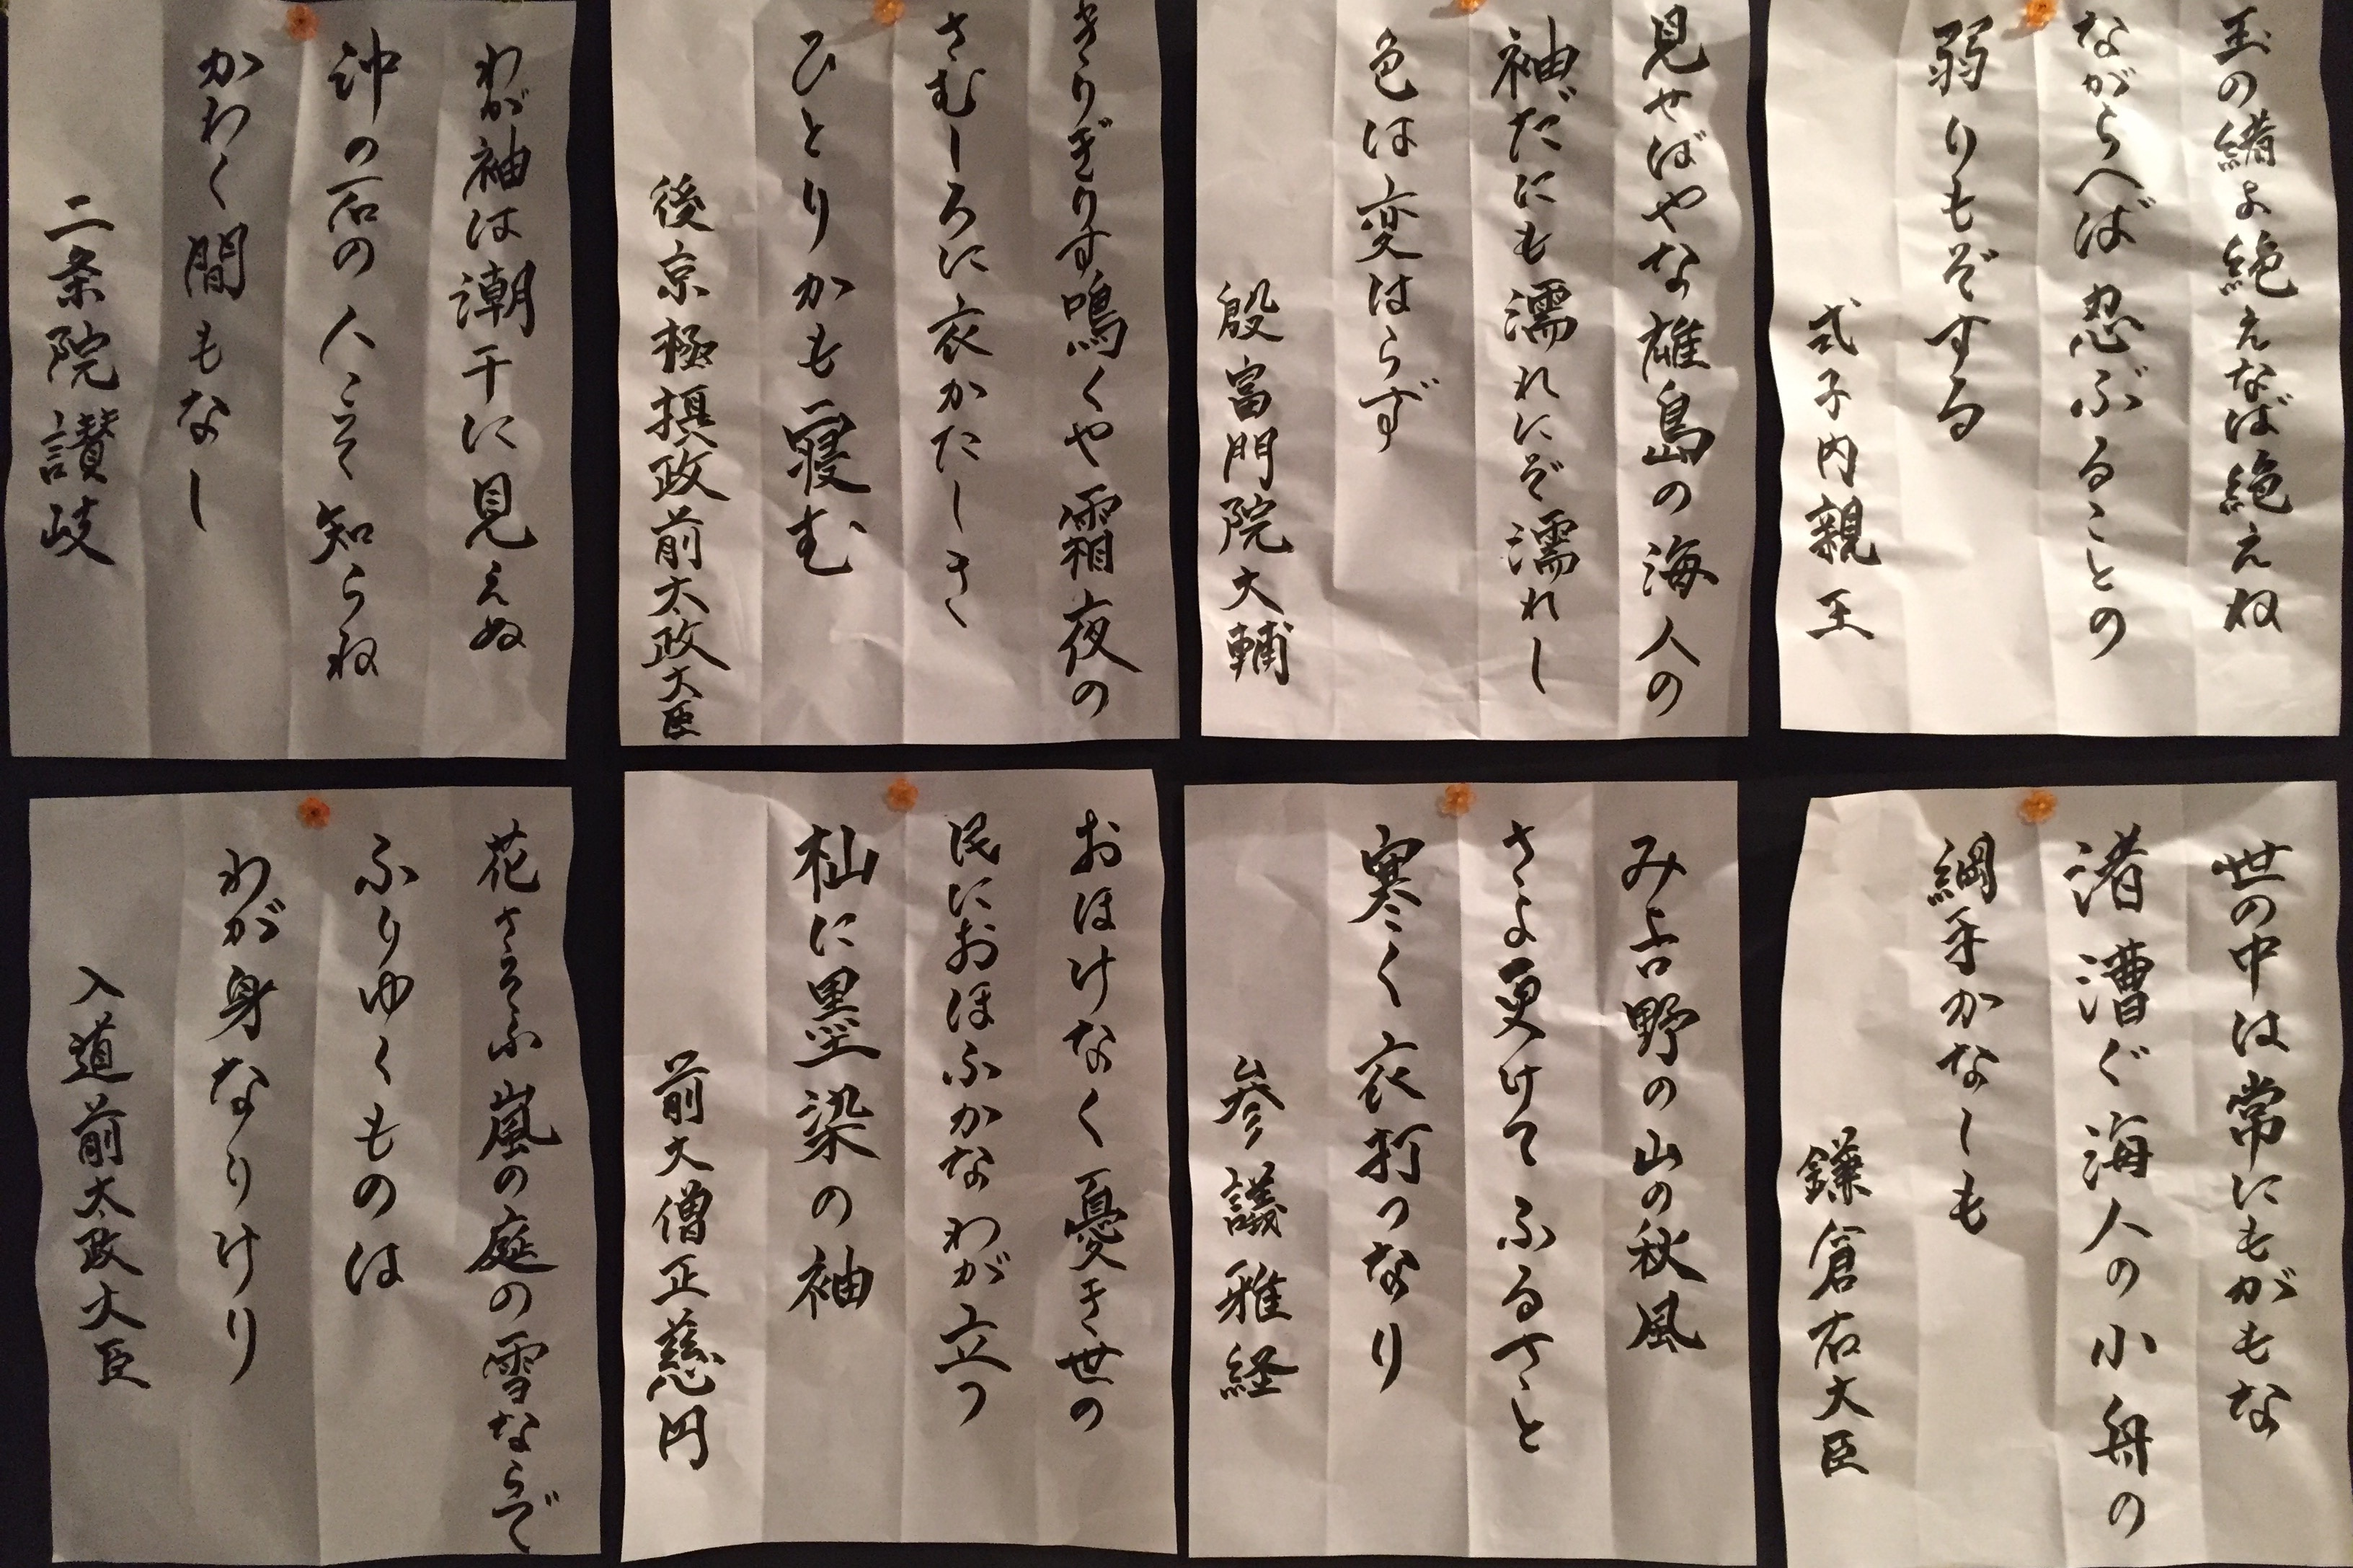 f:id:gengetukurumi:20171105224348j:image